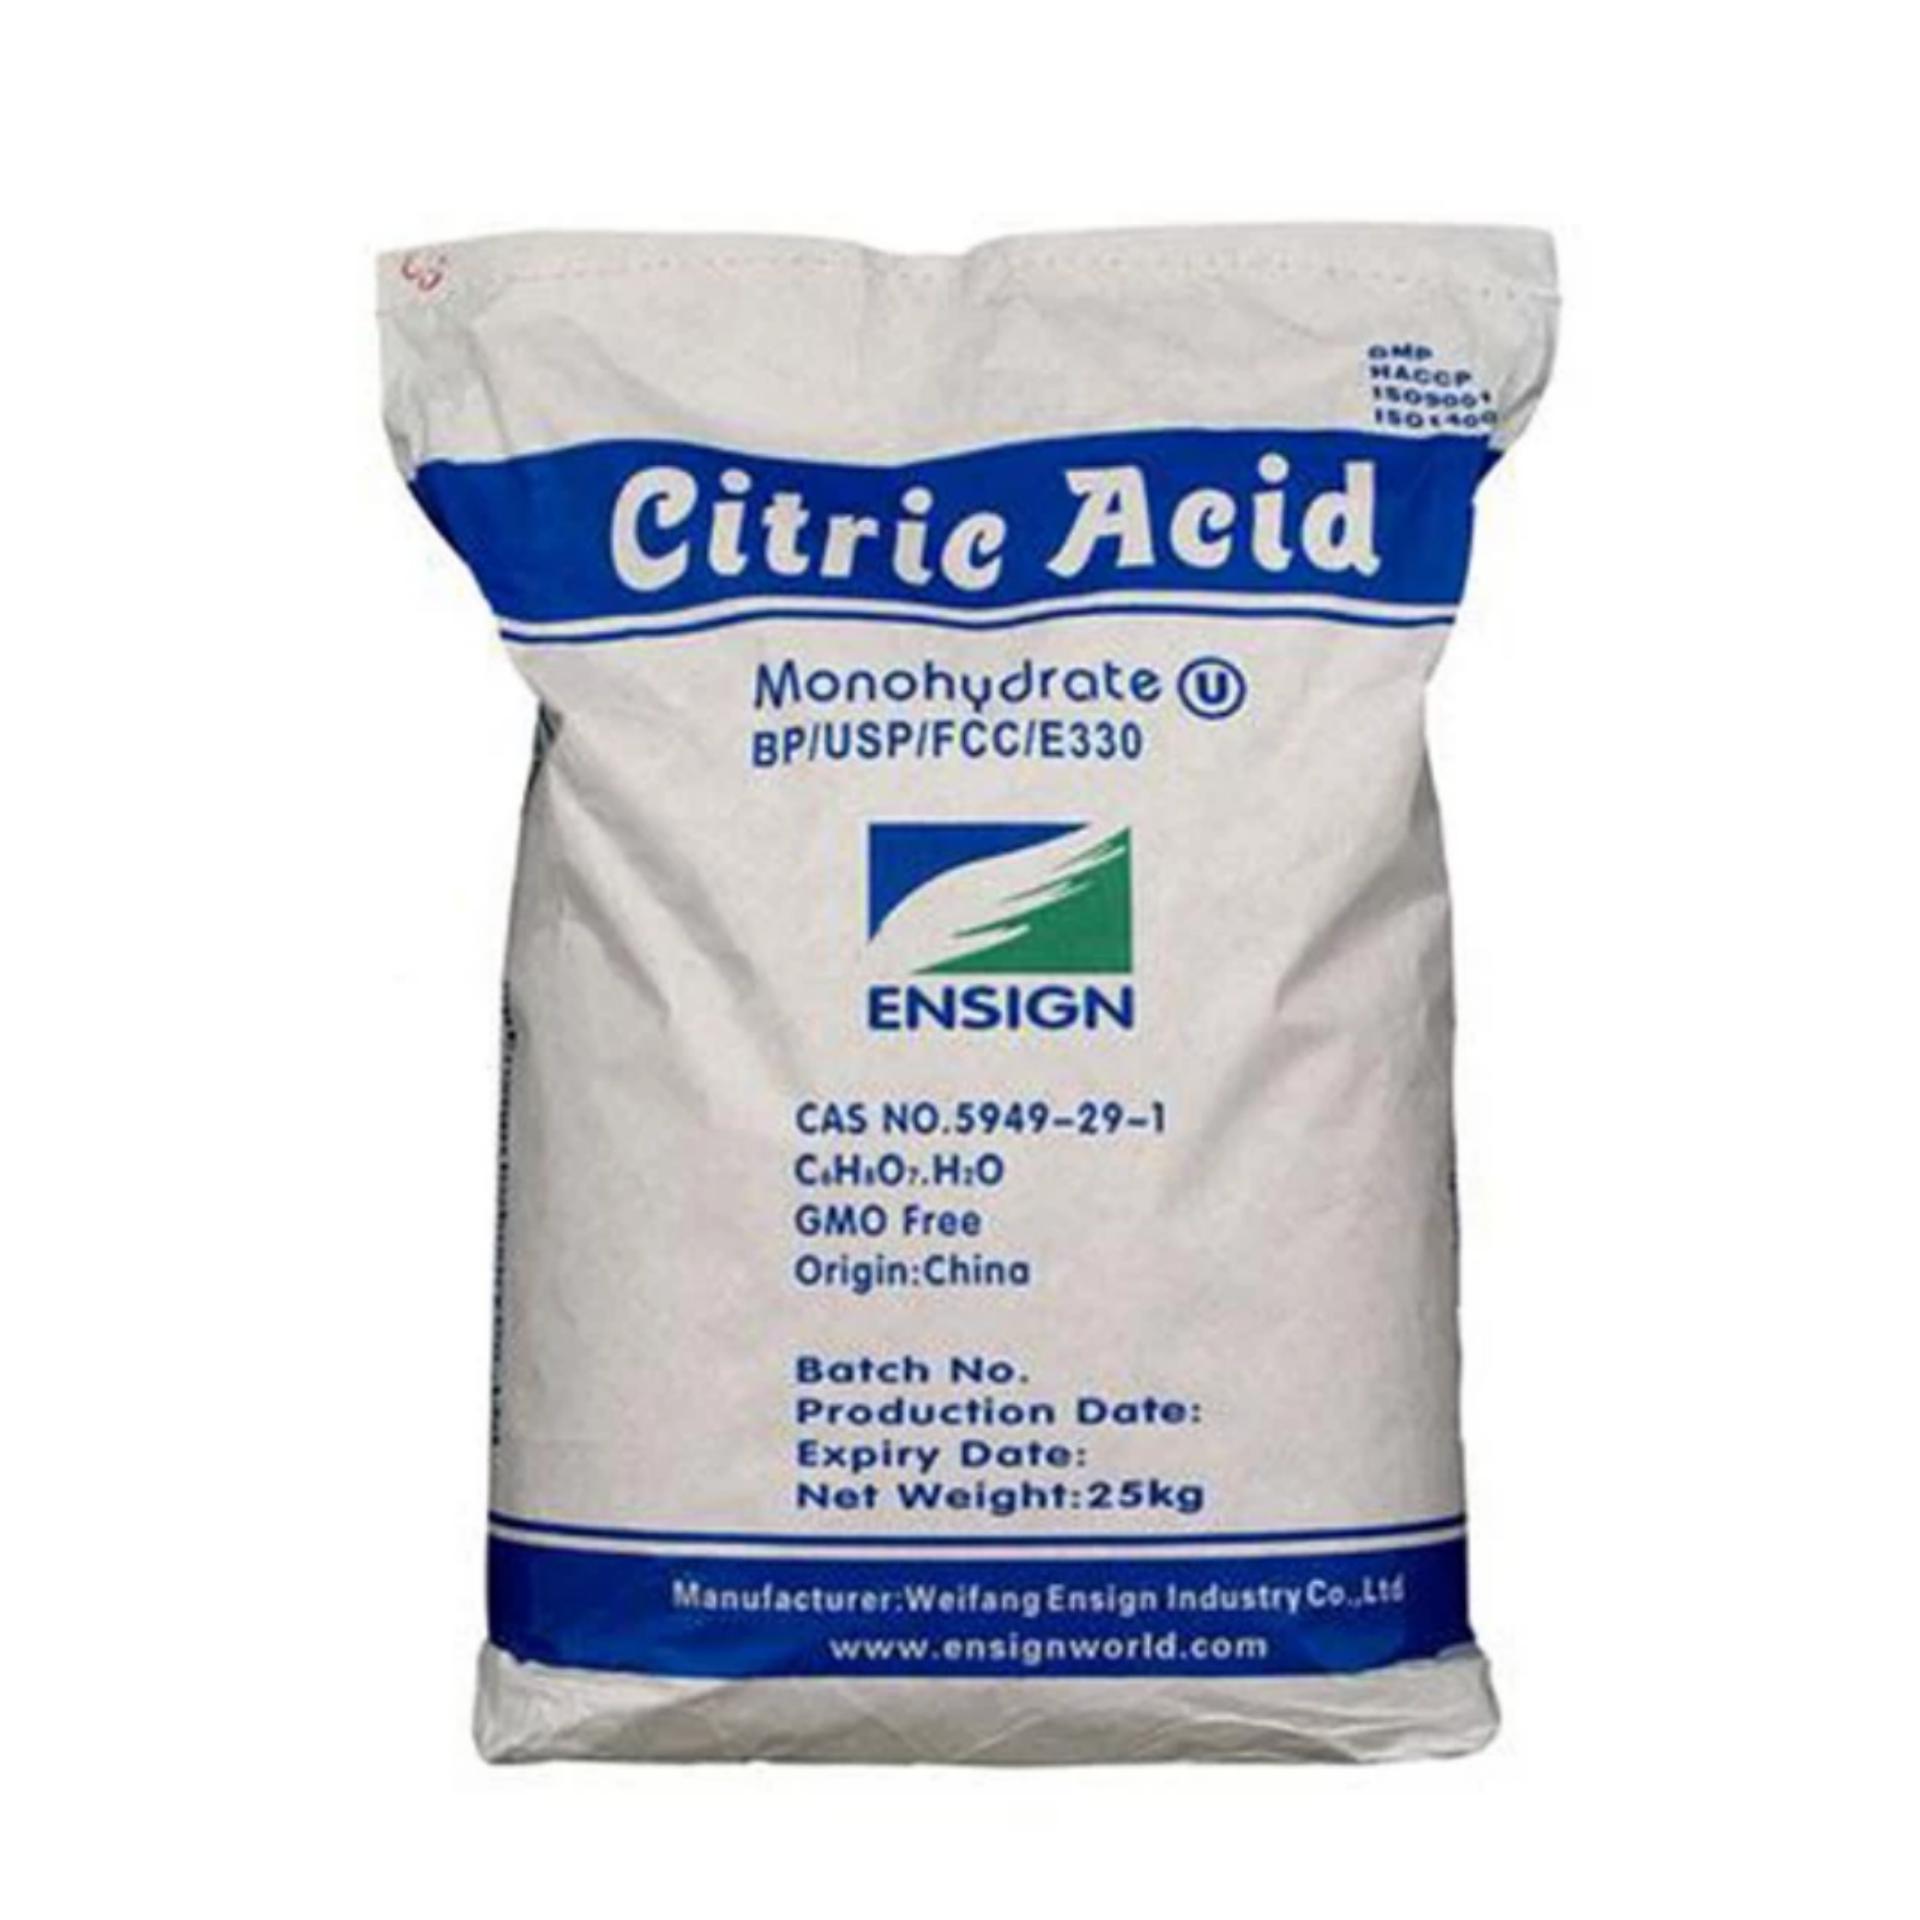 جوهر لیمو اسید سیتریک بمب حمام اسید سیتریک طبیعی